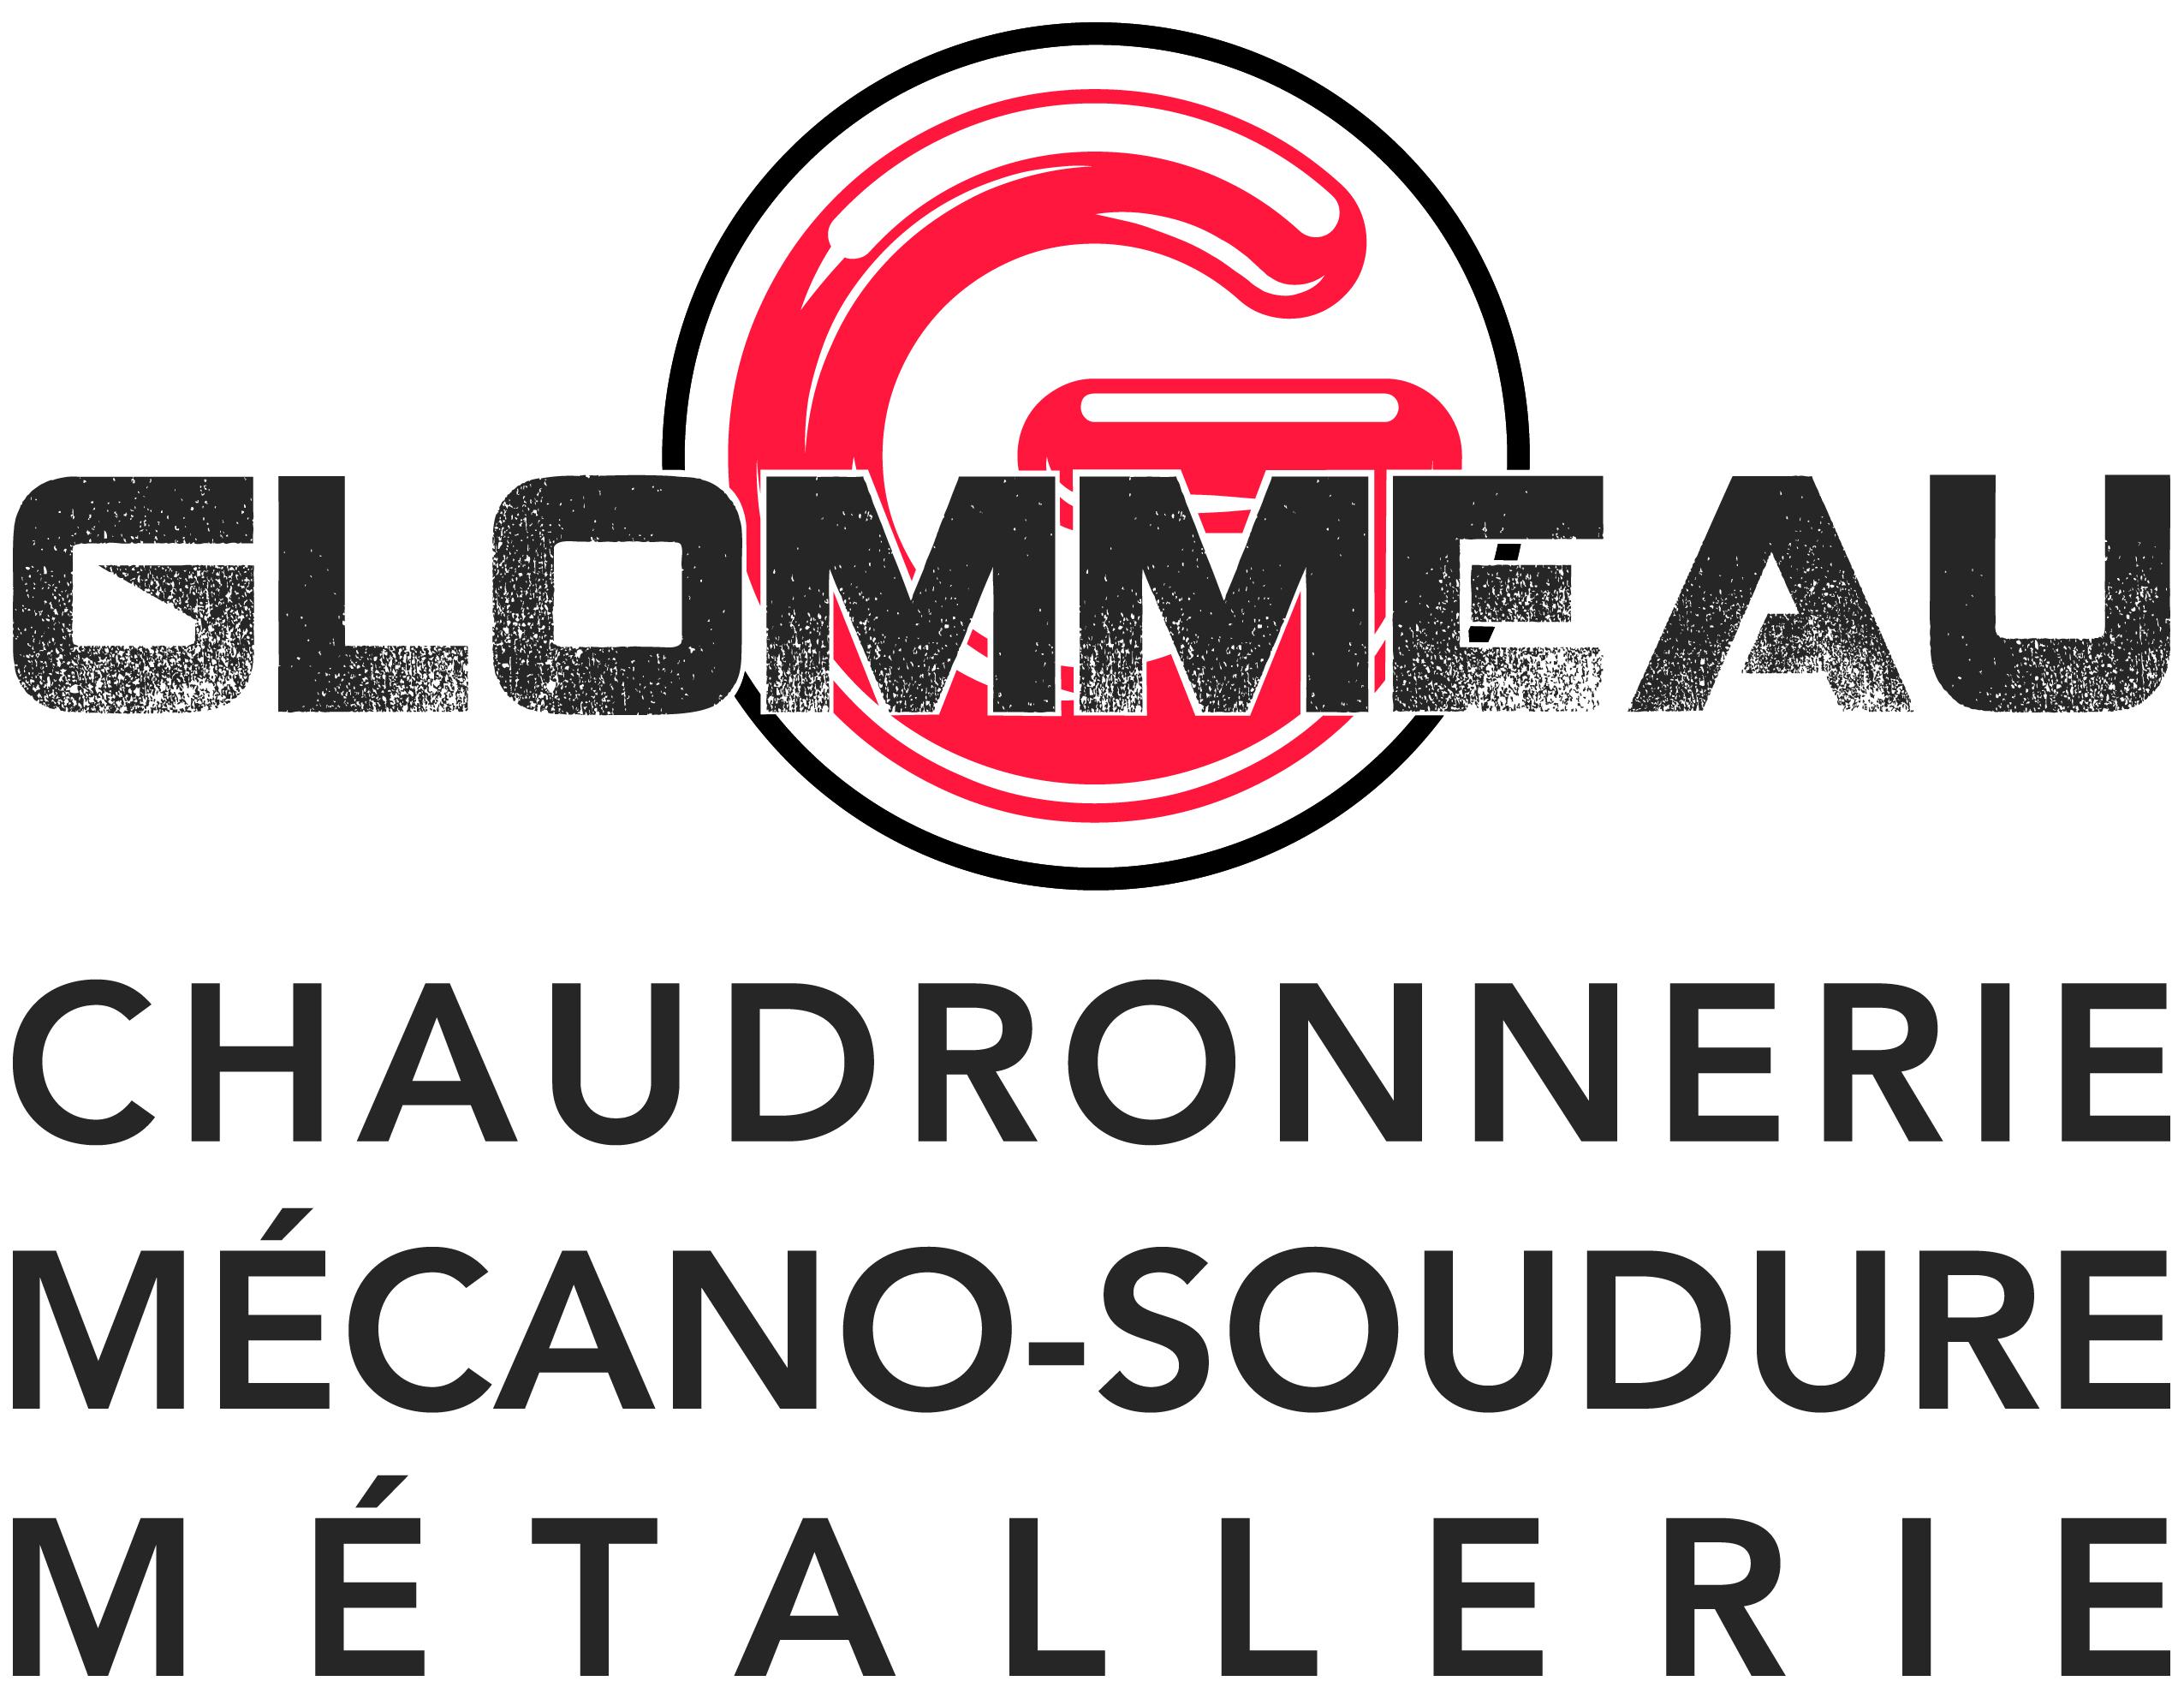 ETABLISSEMENTS BERNARD GLOMMEAU (SARL)